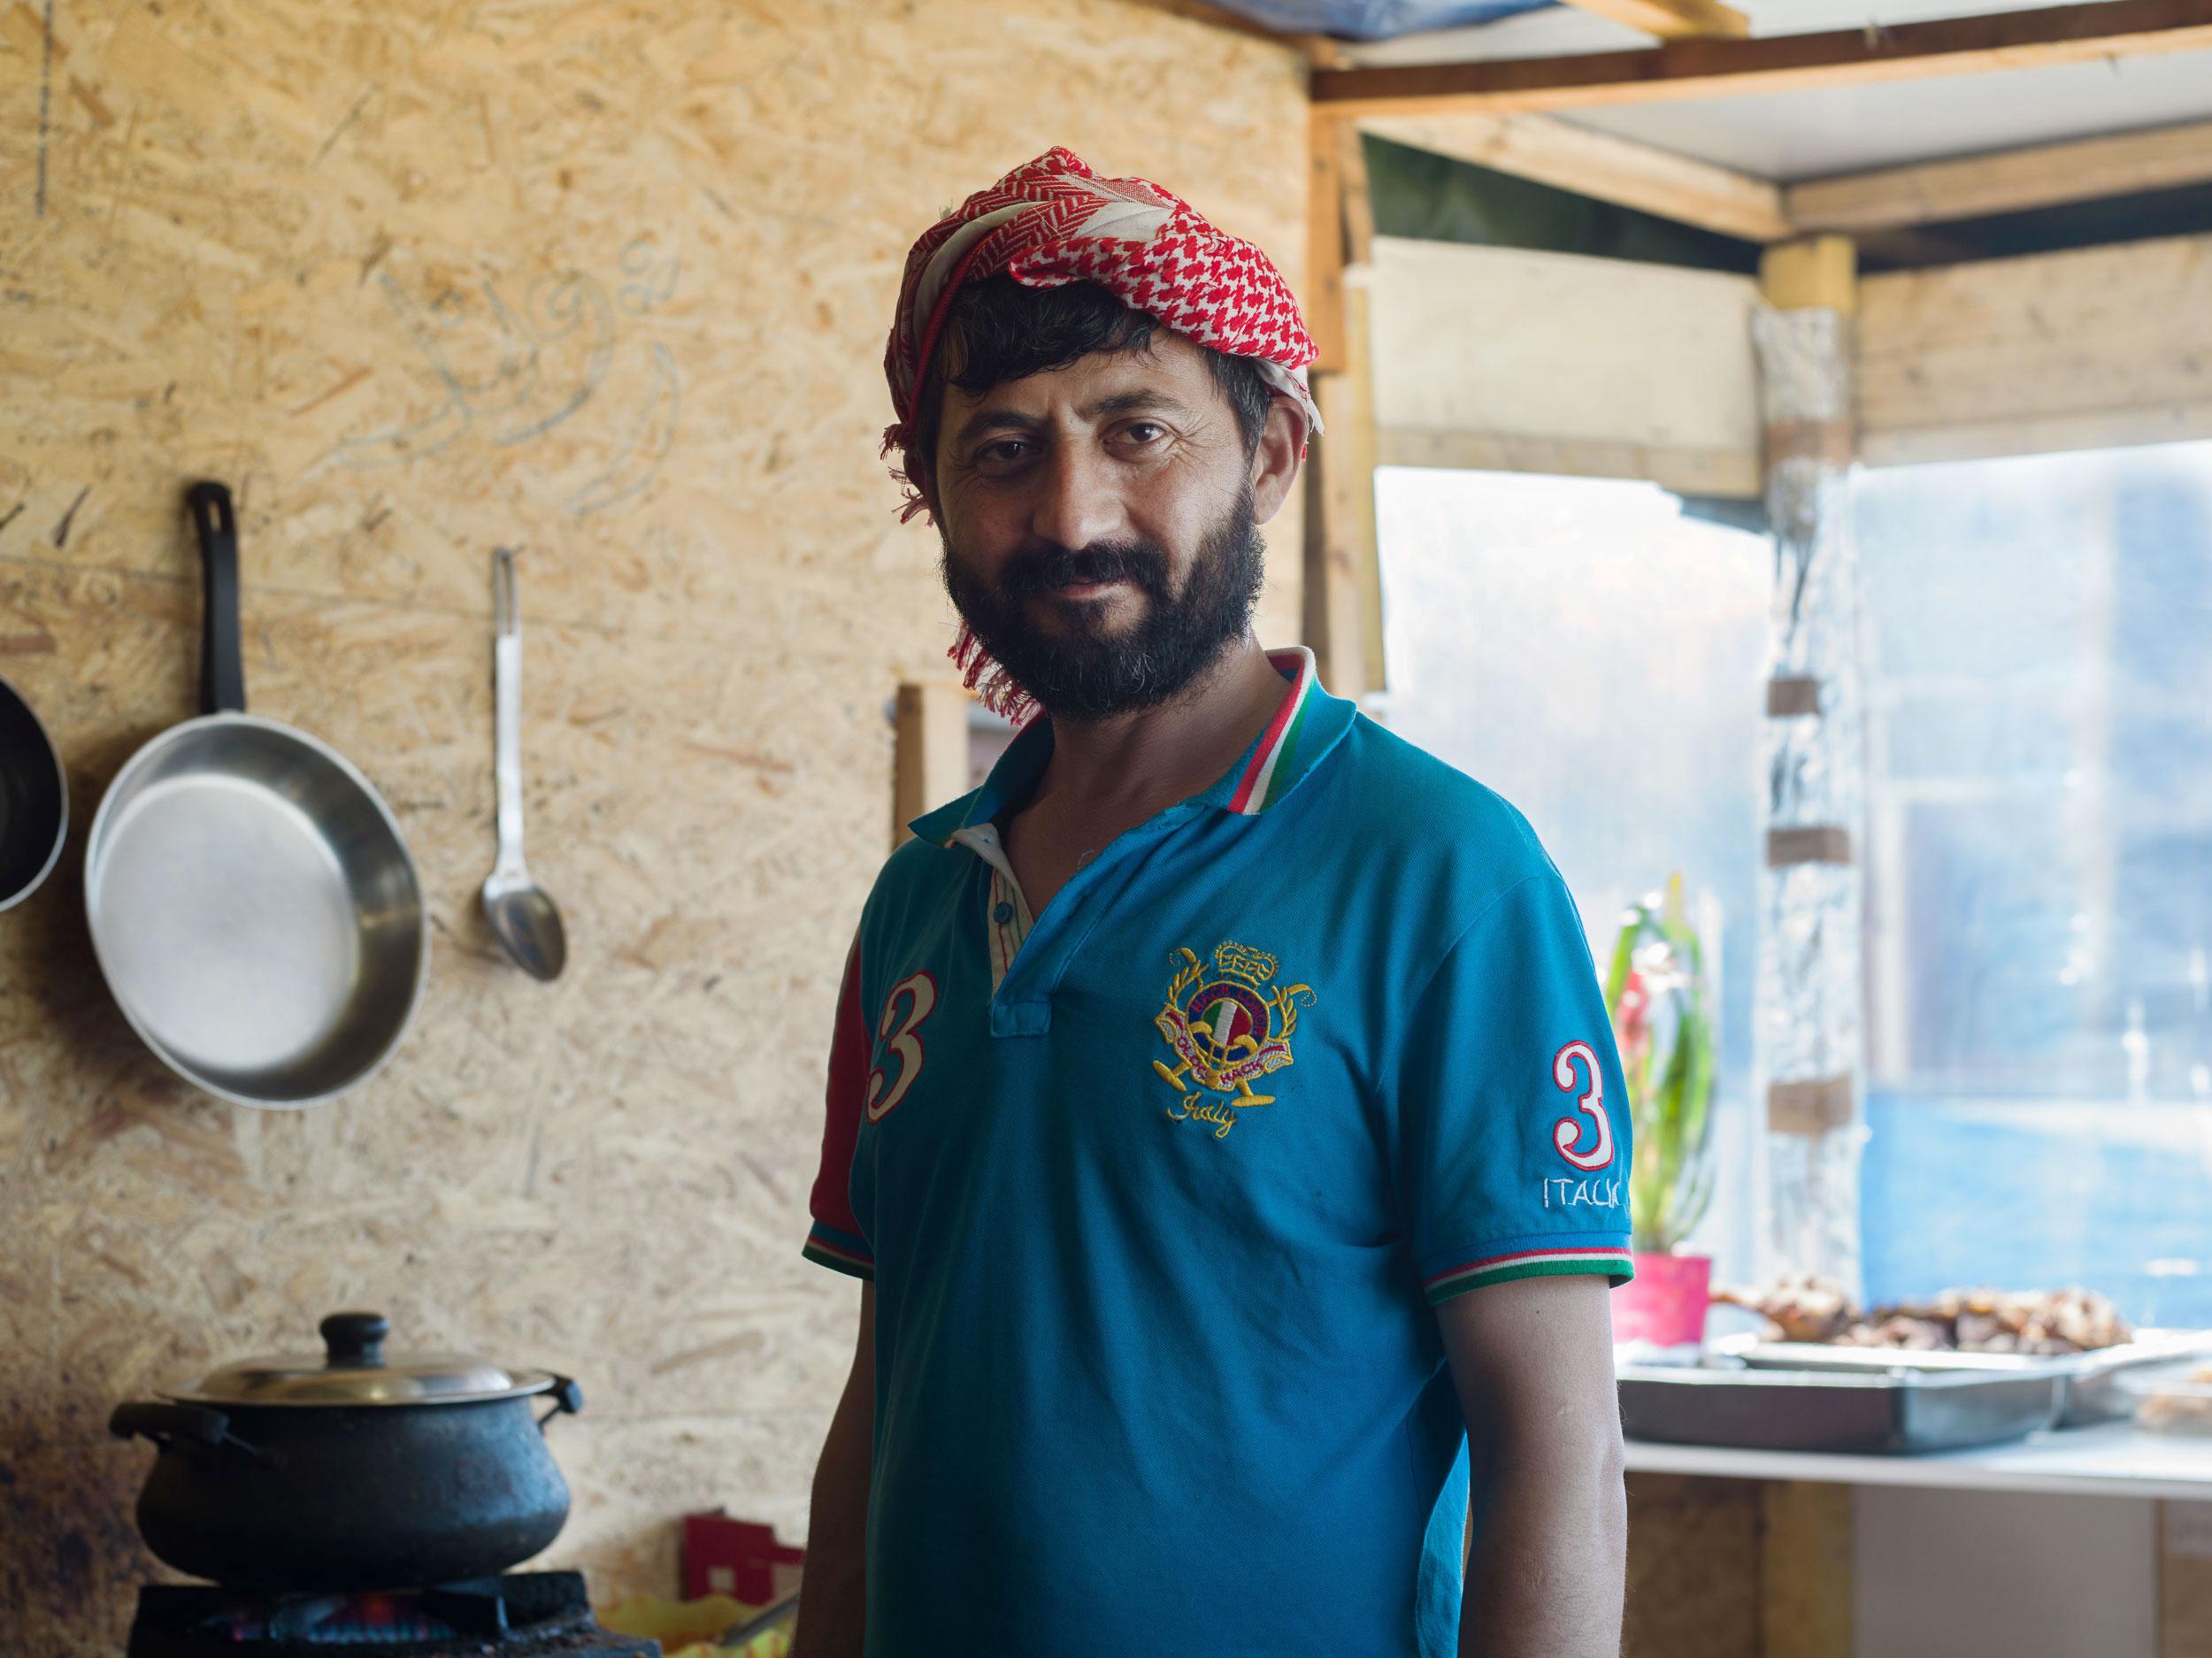 Julian-Ward-Calais-Portrait-Chef.jpg